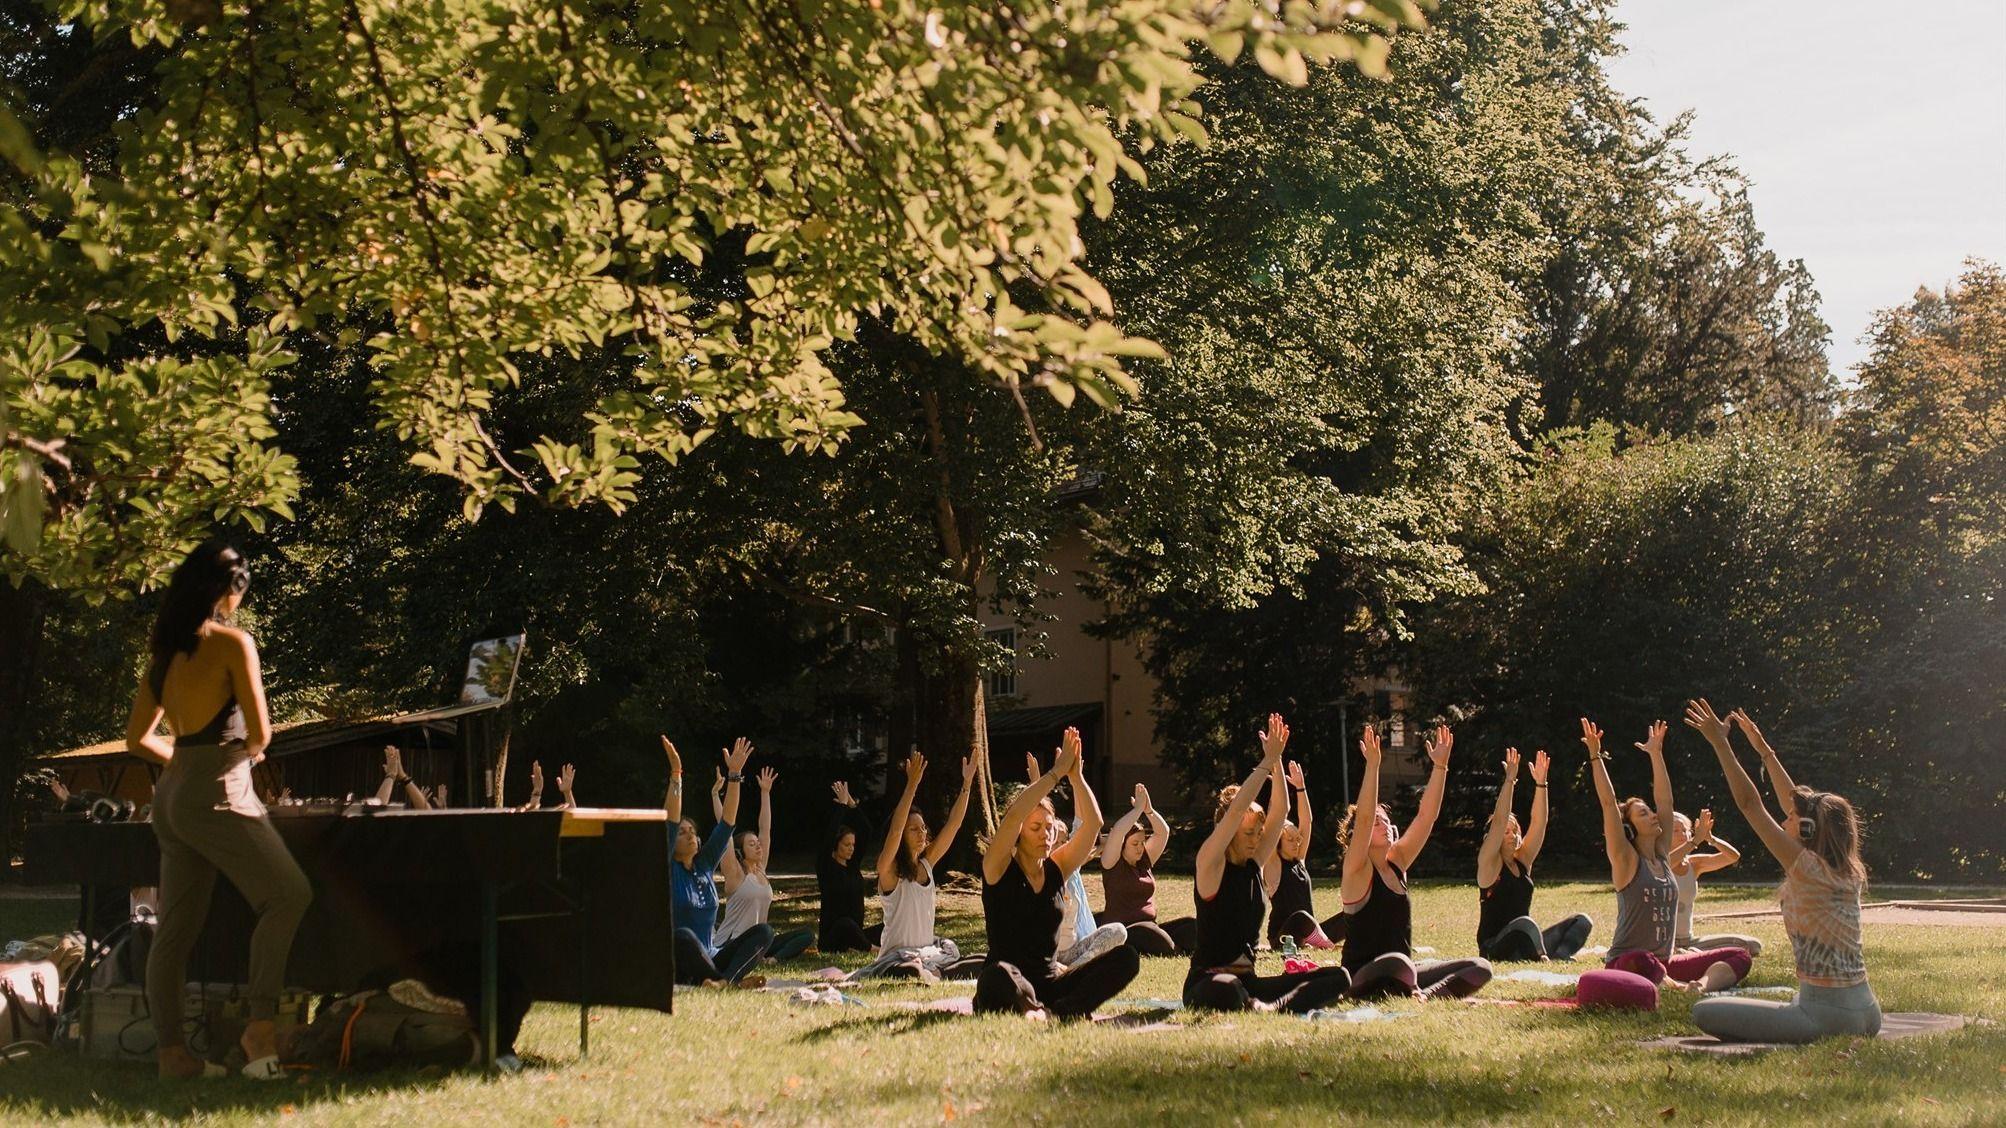 LYLA Soul Yoga - Happy Hour Yoga Flow and Social Dist(dancing) (BYOB)